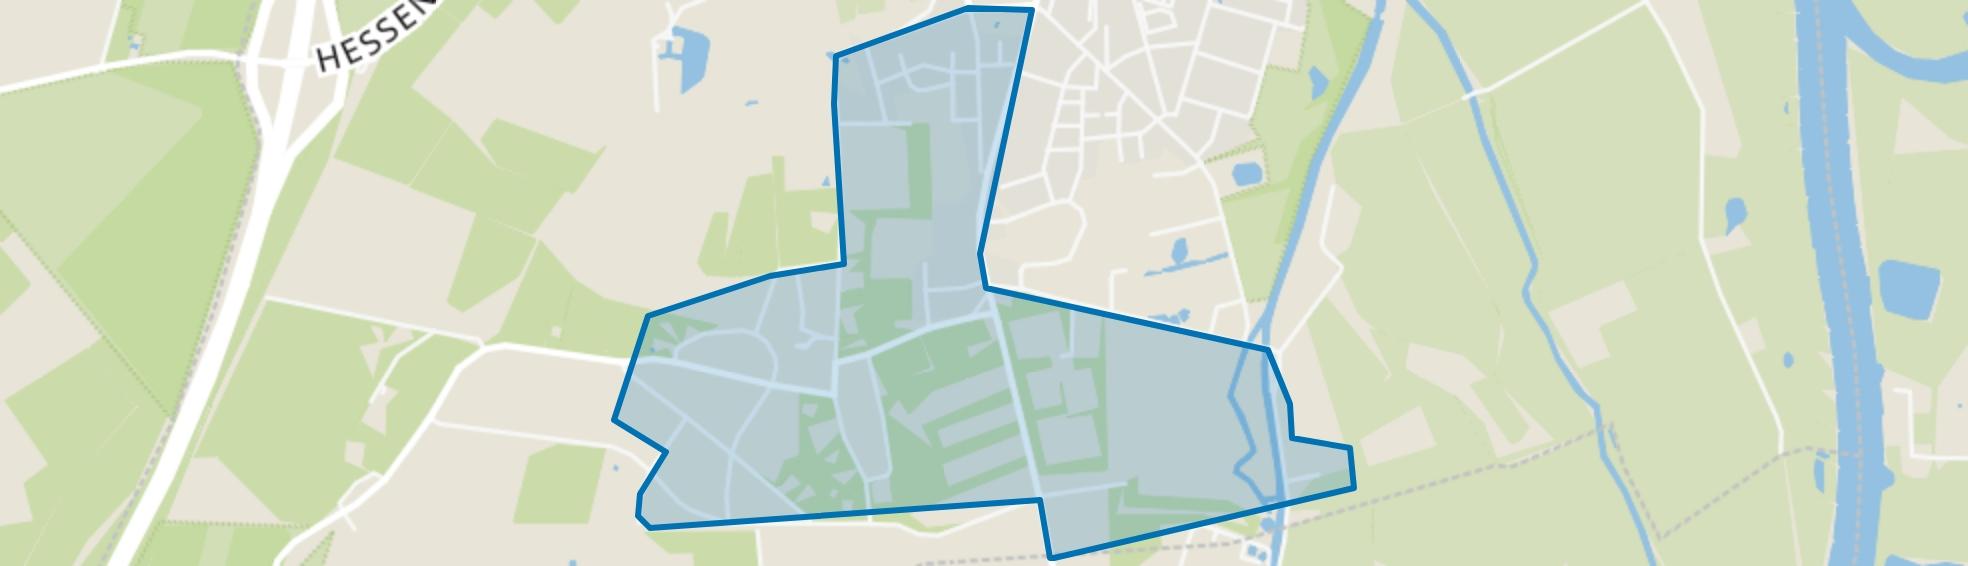 Villapark, Hattem map